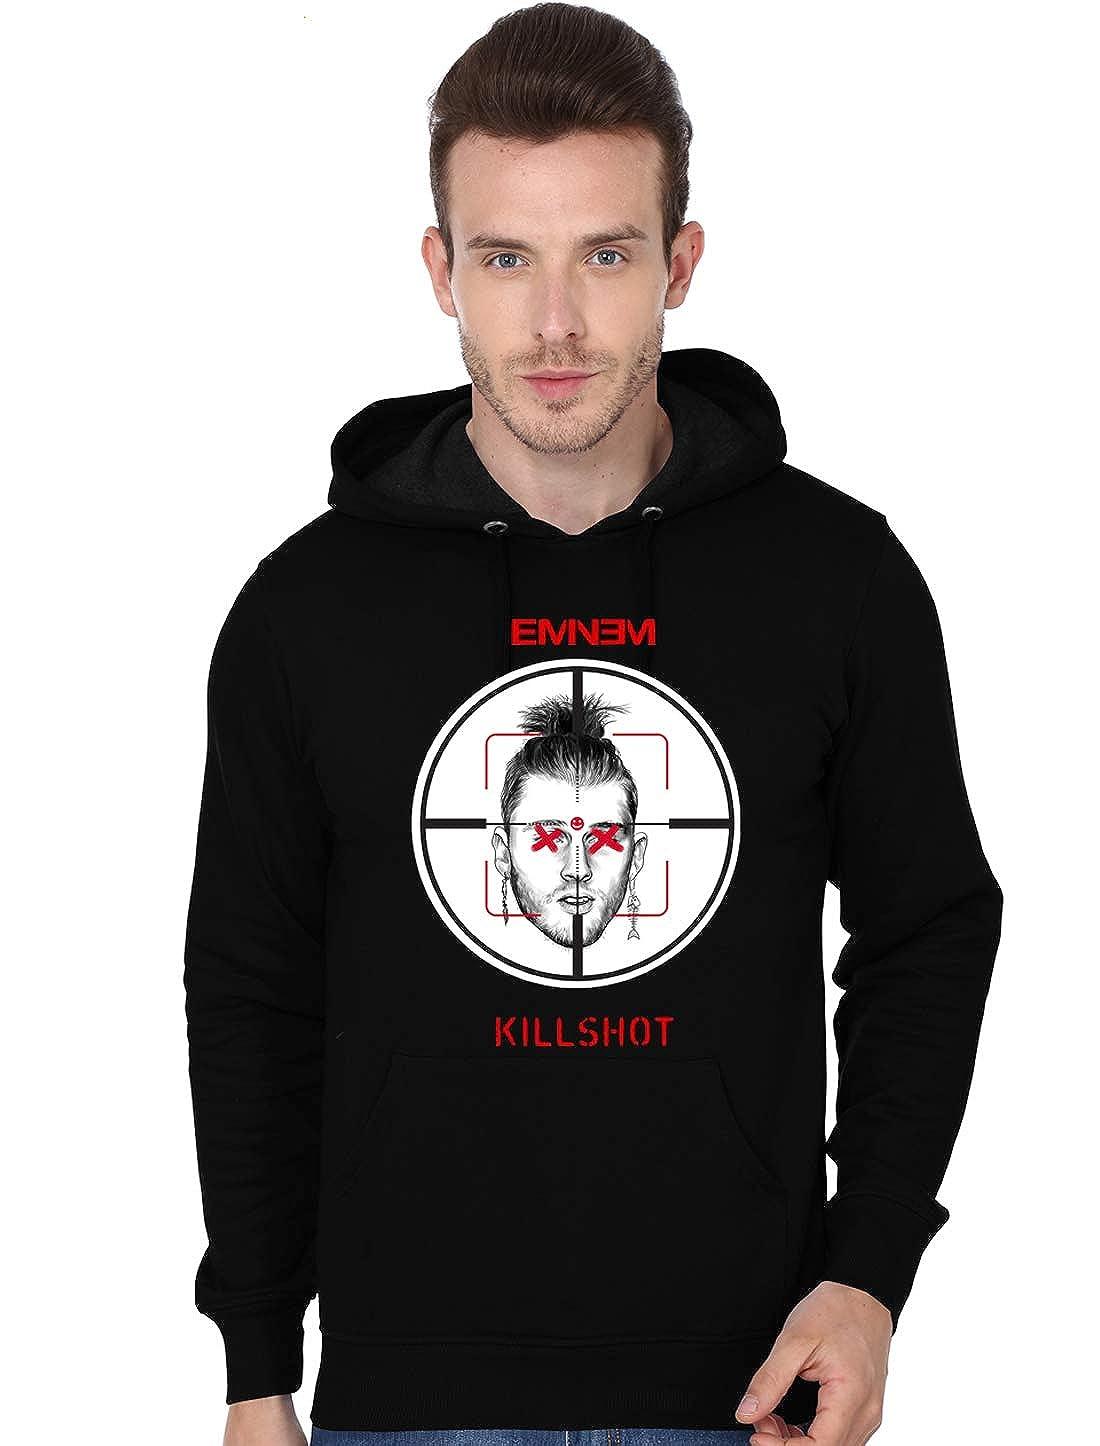 10b7d51d705aa Gui Shirts Men's Cotton Eminem Kamikaze Killshot Black Hoodie ...